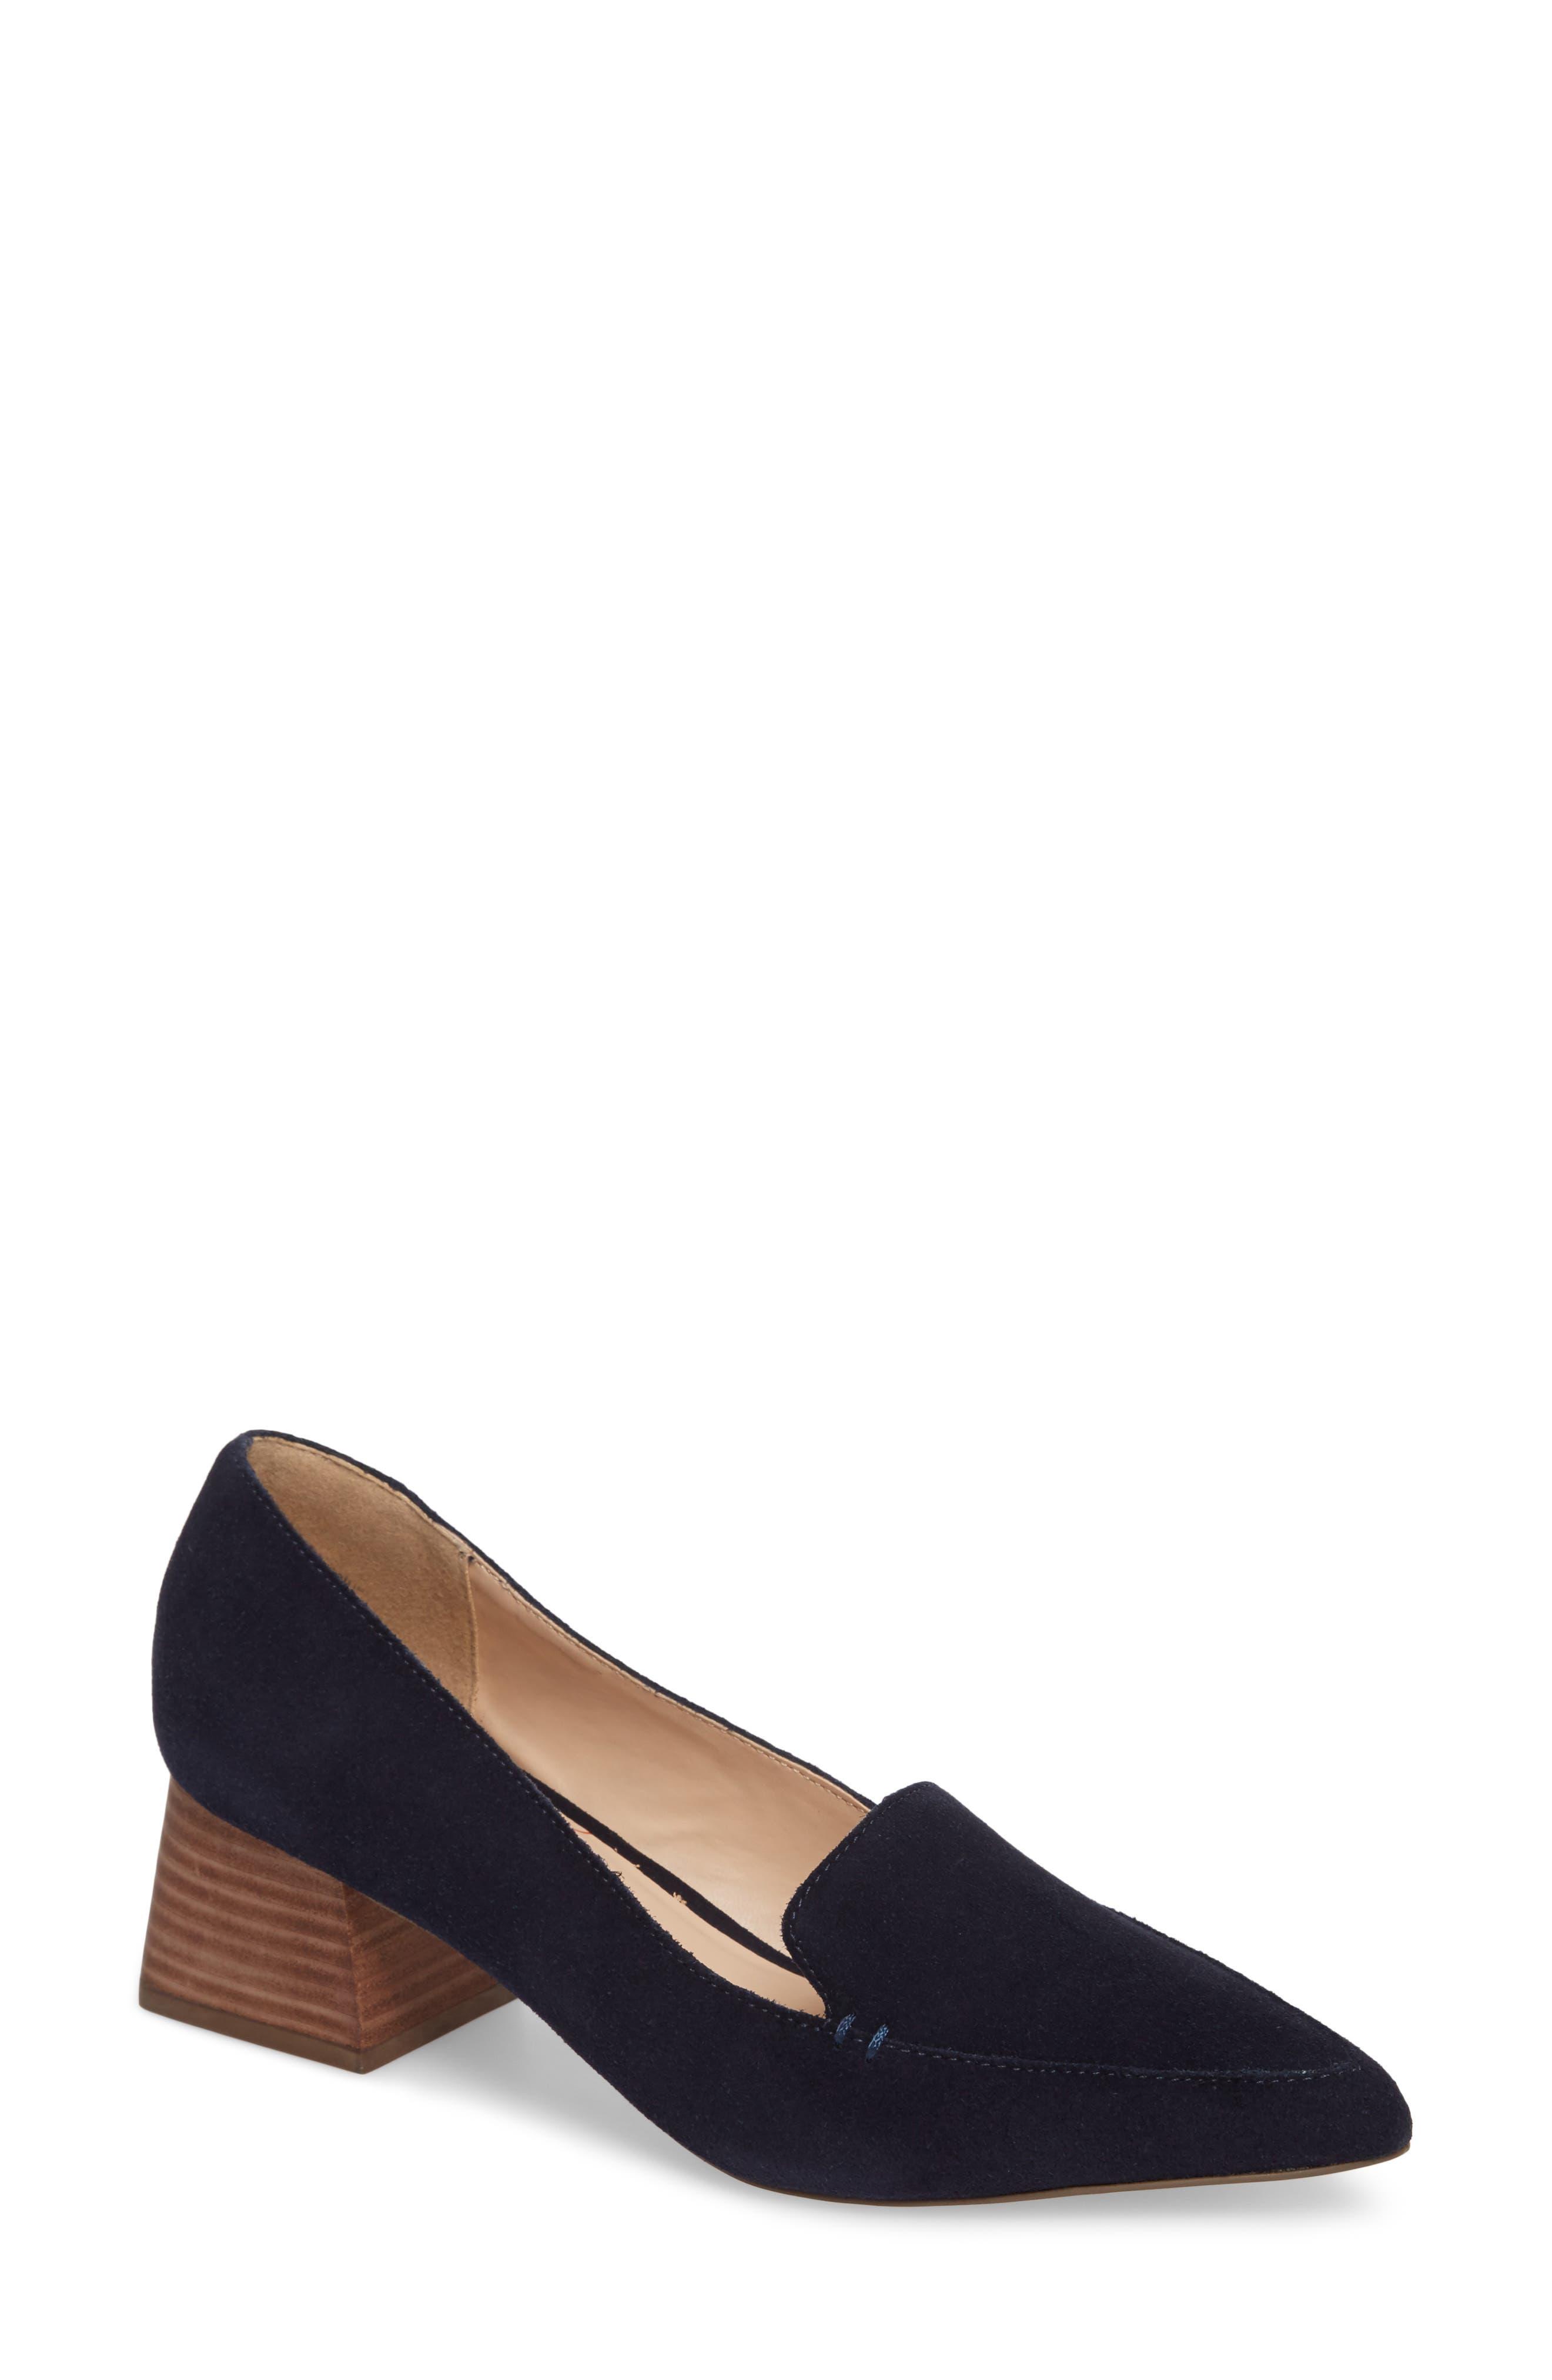 SOLE SOCIETY, Mavis Flare Heel Loafer, Main thumbnail 1, color, OMBRE BLUE